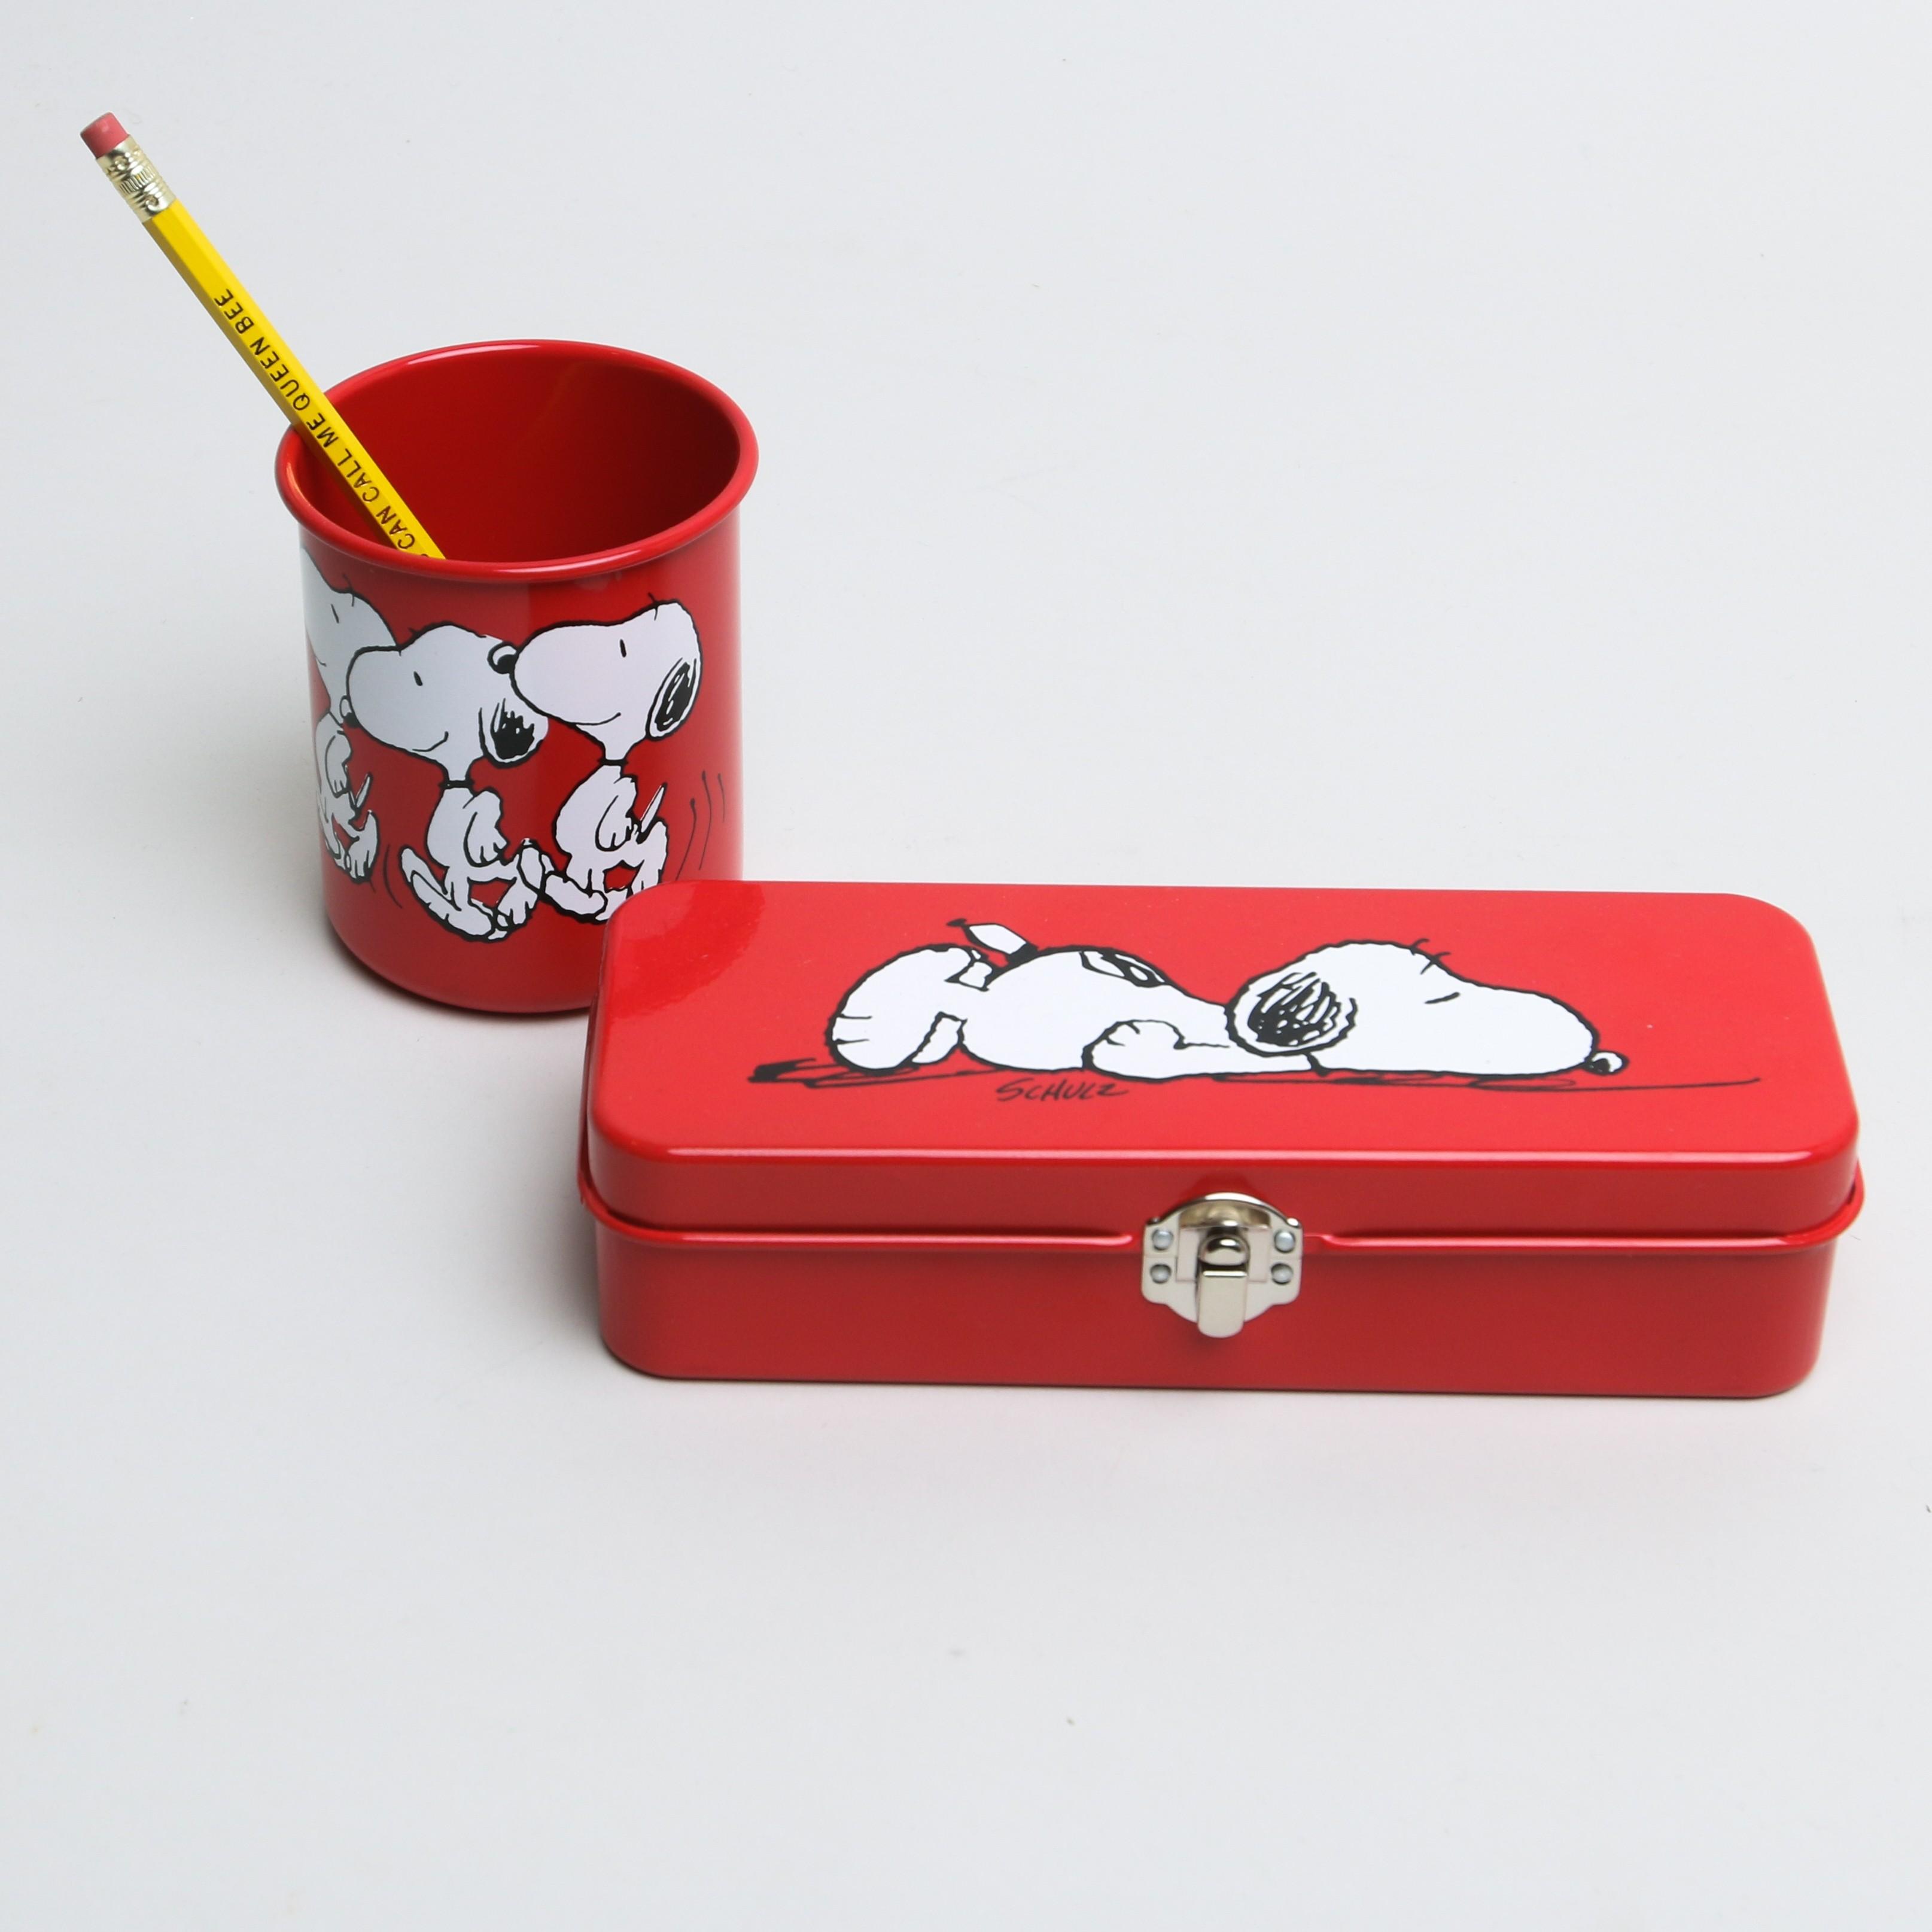 Snoopy Tin Pencil Case Red